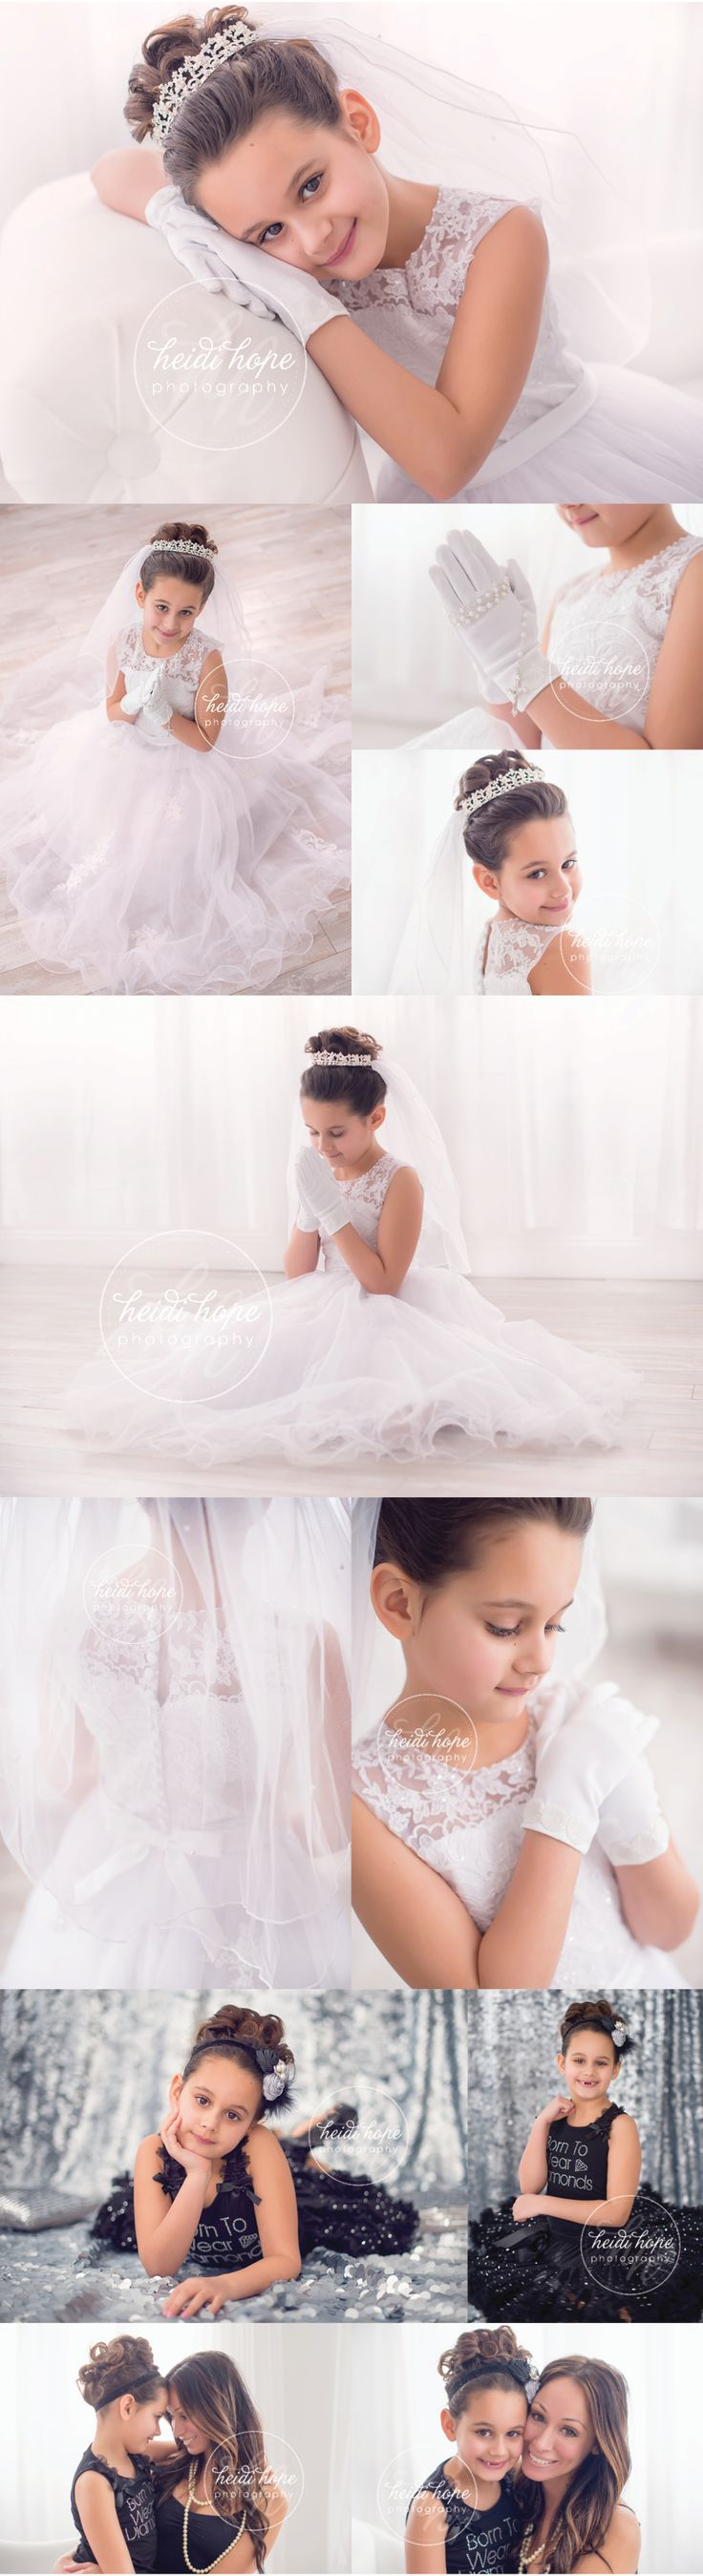 Blog | Heidi Hope Photography